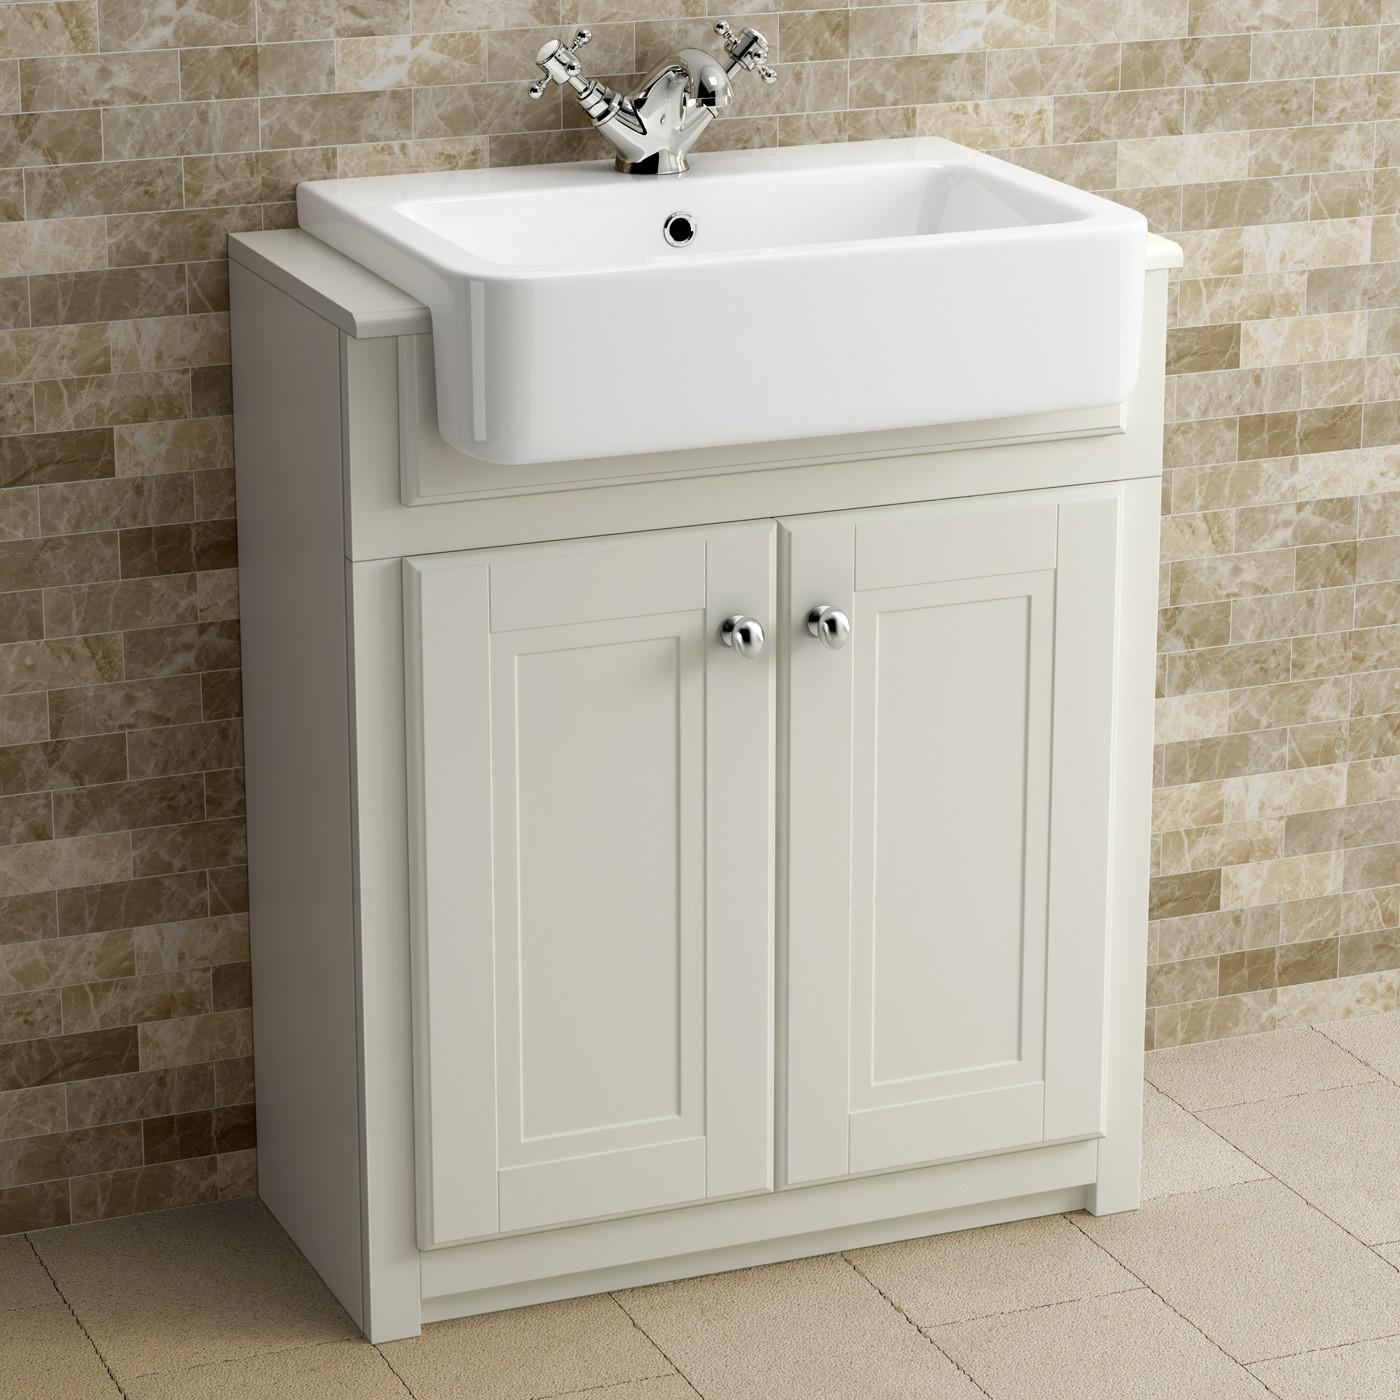 Bathroom Sink Vanity Units Best Traditional Bathroom Vanity Unit Basin Sink Storage Furniture Concept